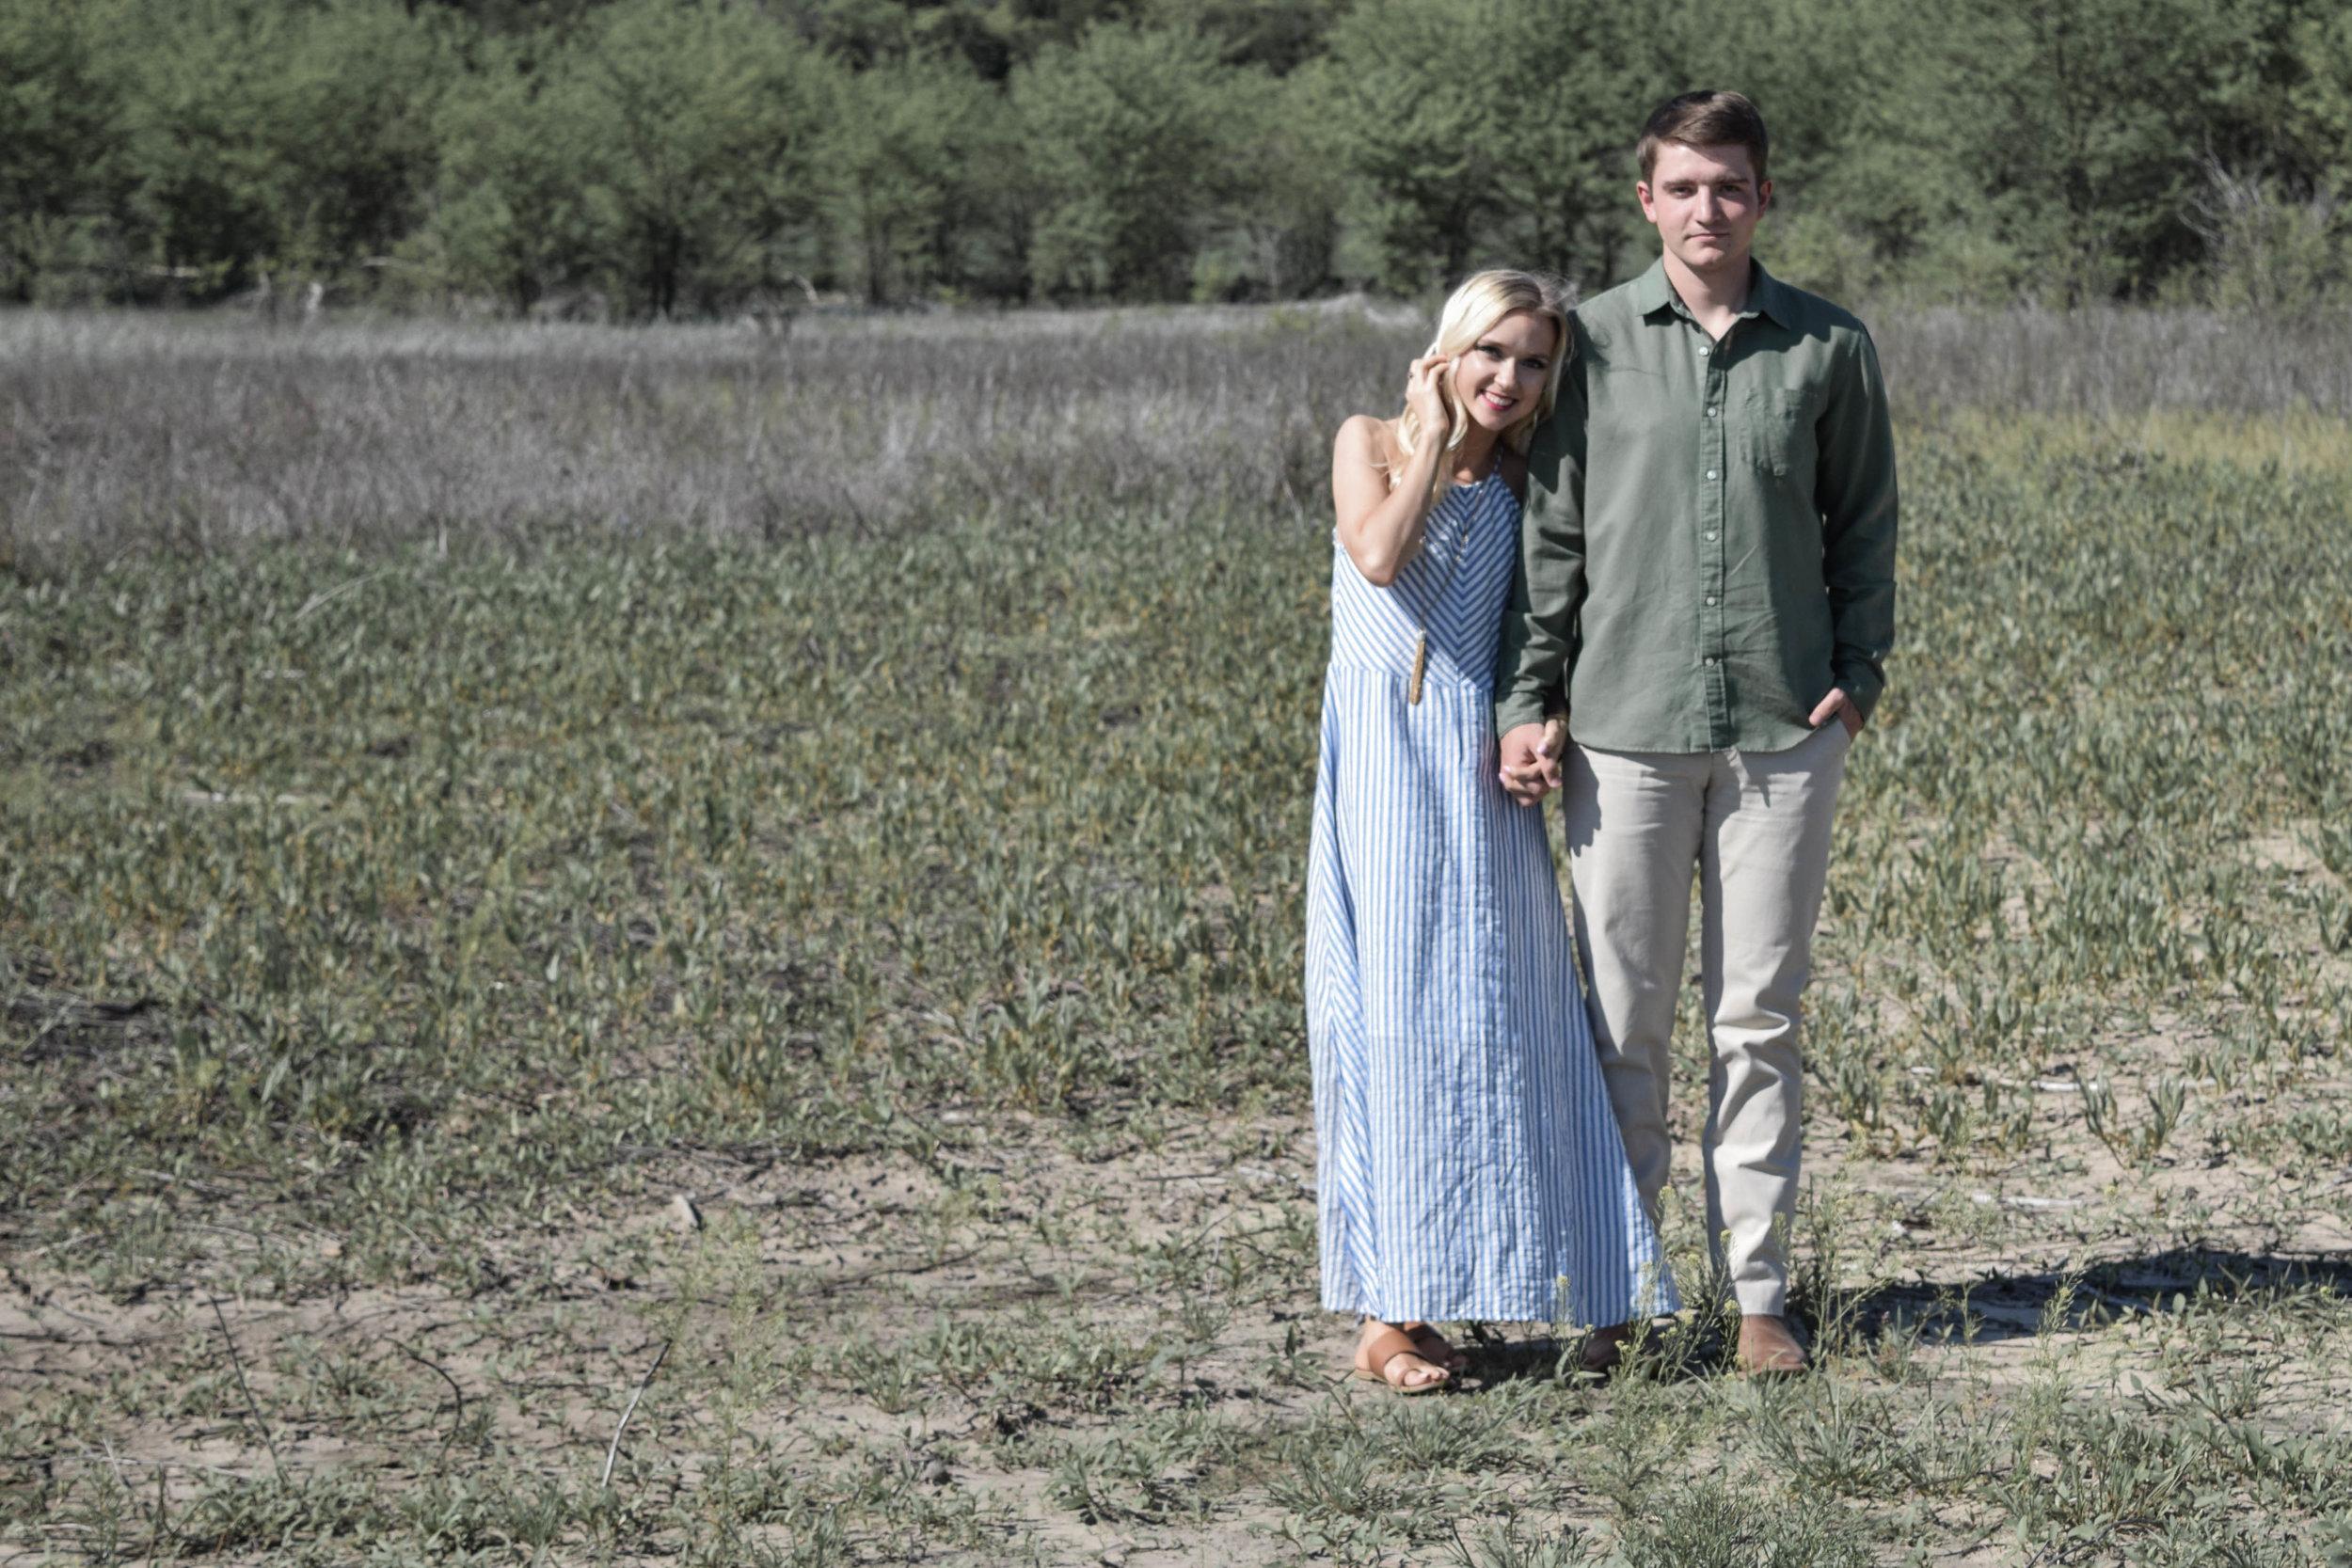 Kenzie + Nate | Spring 2017 | Tuttle Creek State Park | Engagement Session